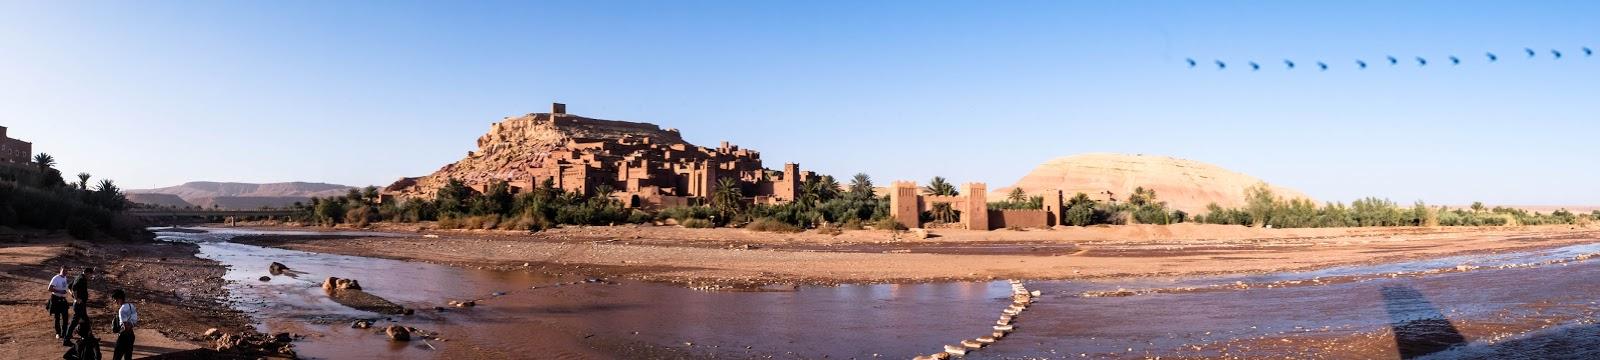 Morocco Travel Guide | Sammy Huynn